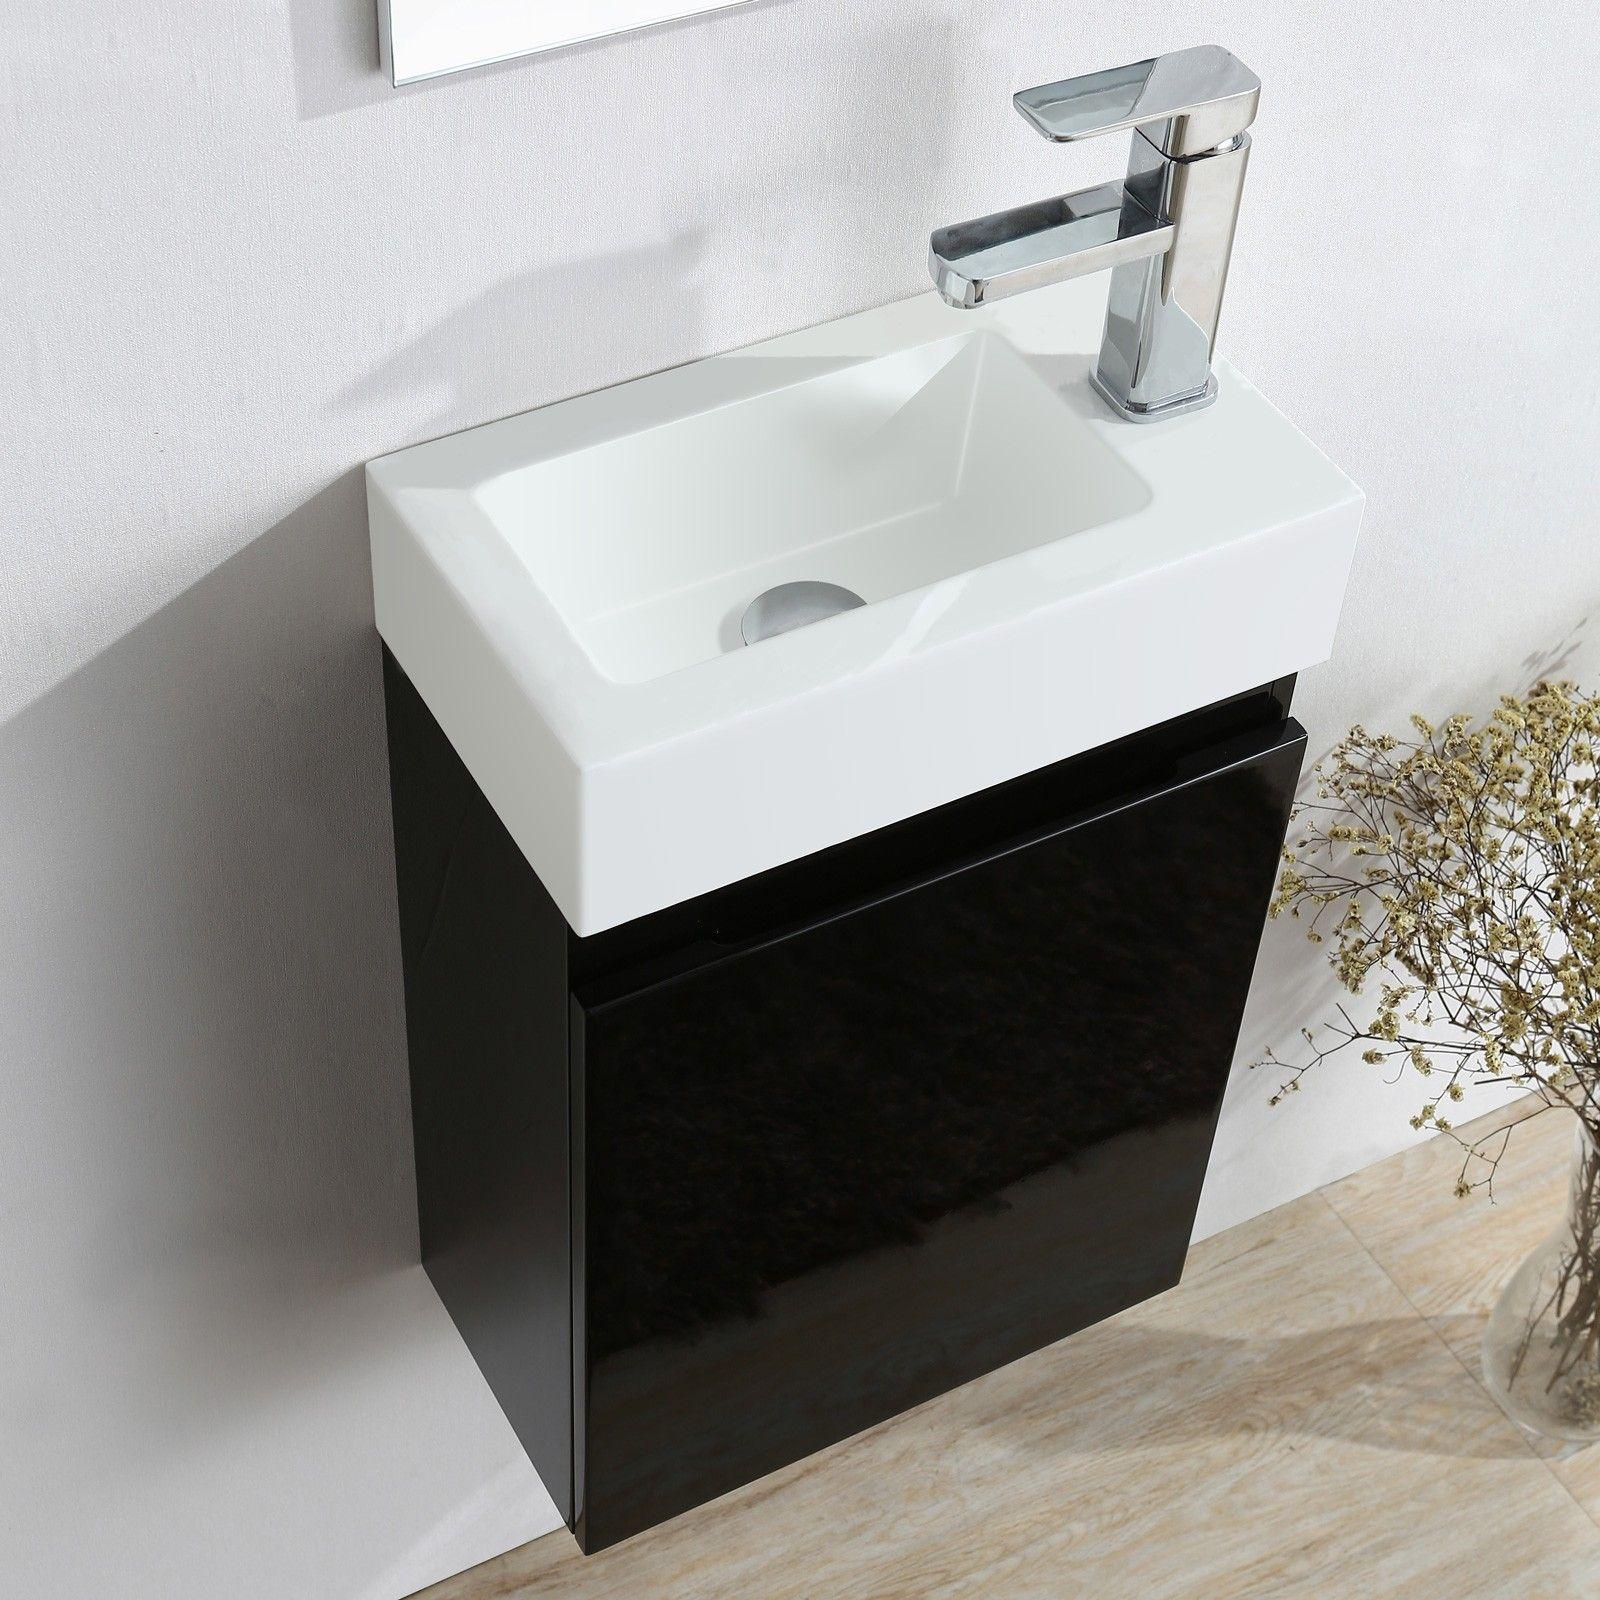 Vanity Unit White Resin Bathroom